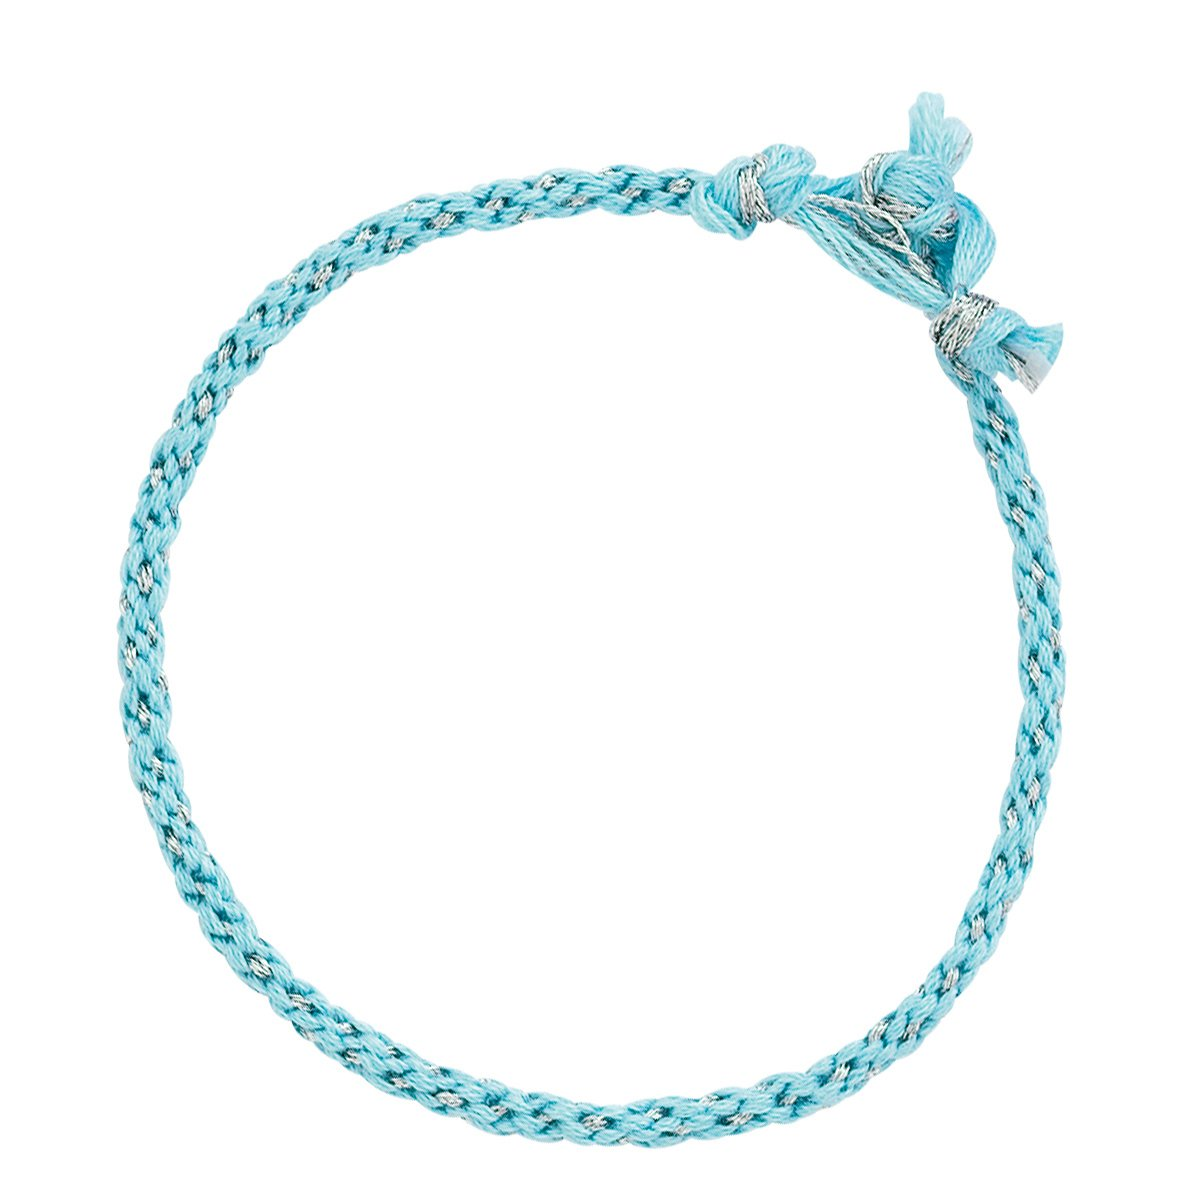 Makes 12 Creativity for Kids Activity Kits-Friendship Bracelets